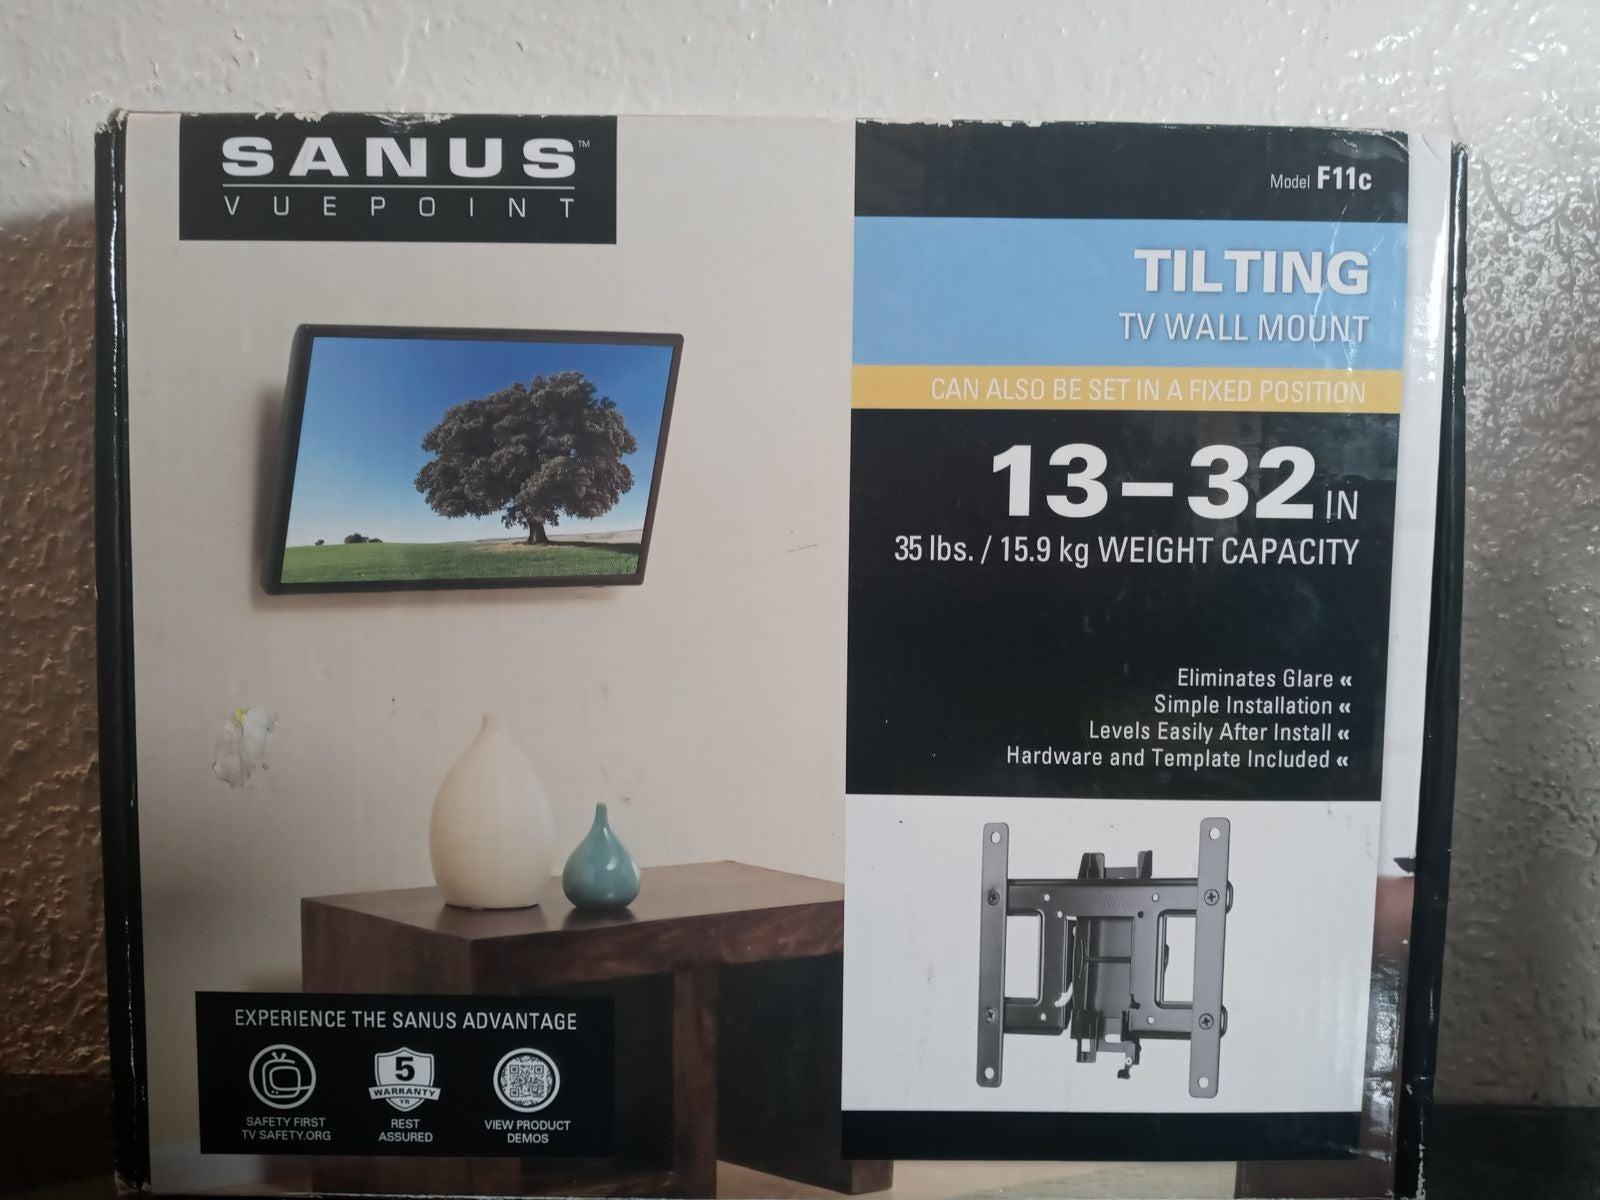 Sanus tilting TV Wall mount 13-32in.